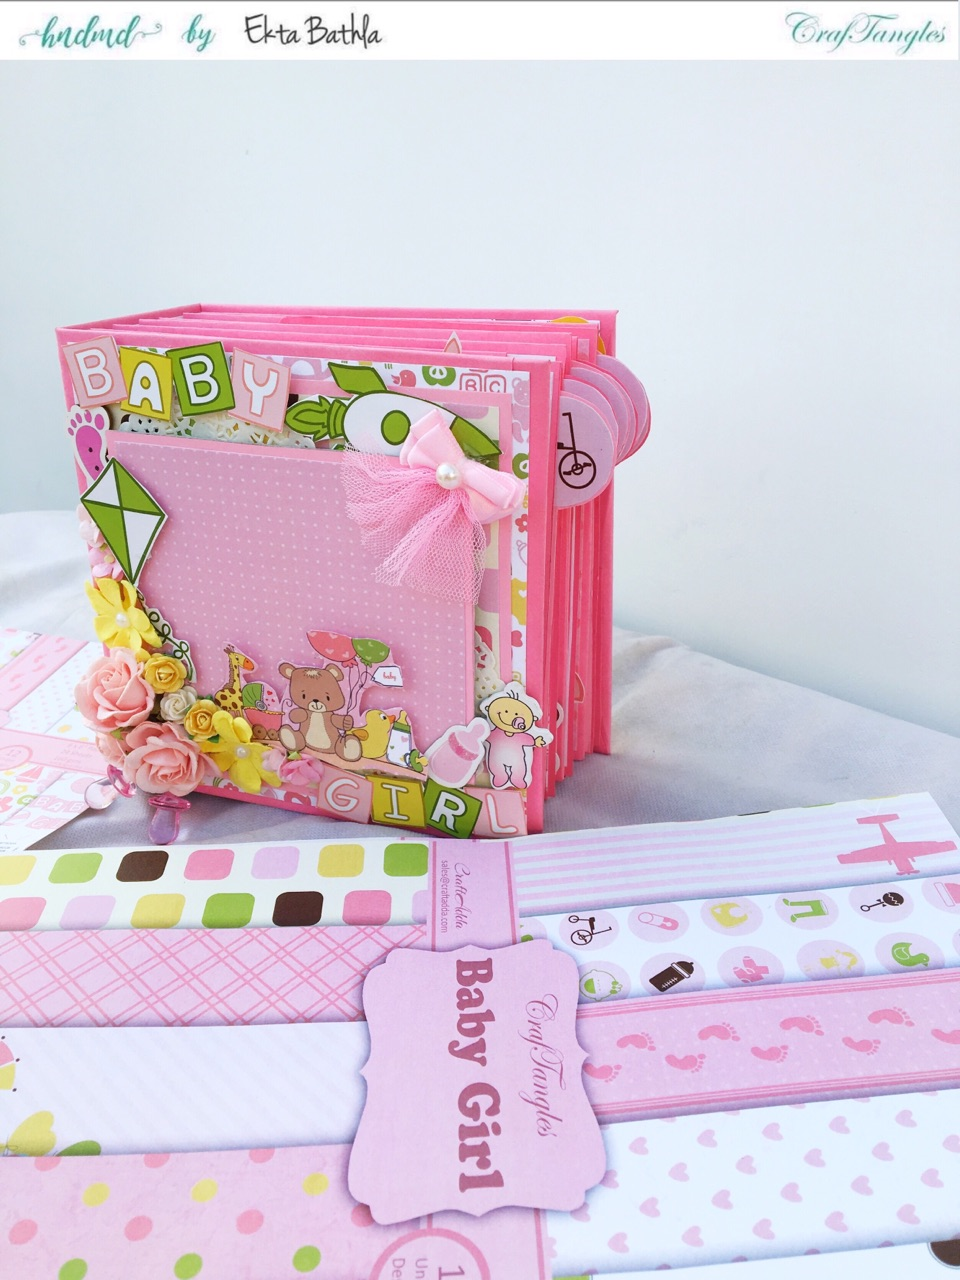 Baby Girl mini album showcasing Baby Girl Elements Pack by CrafTangles 15